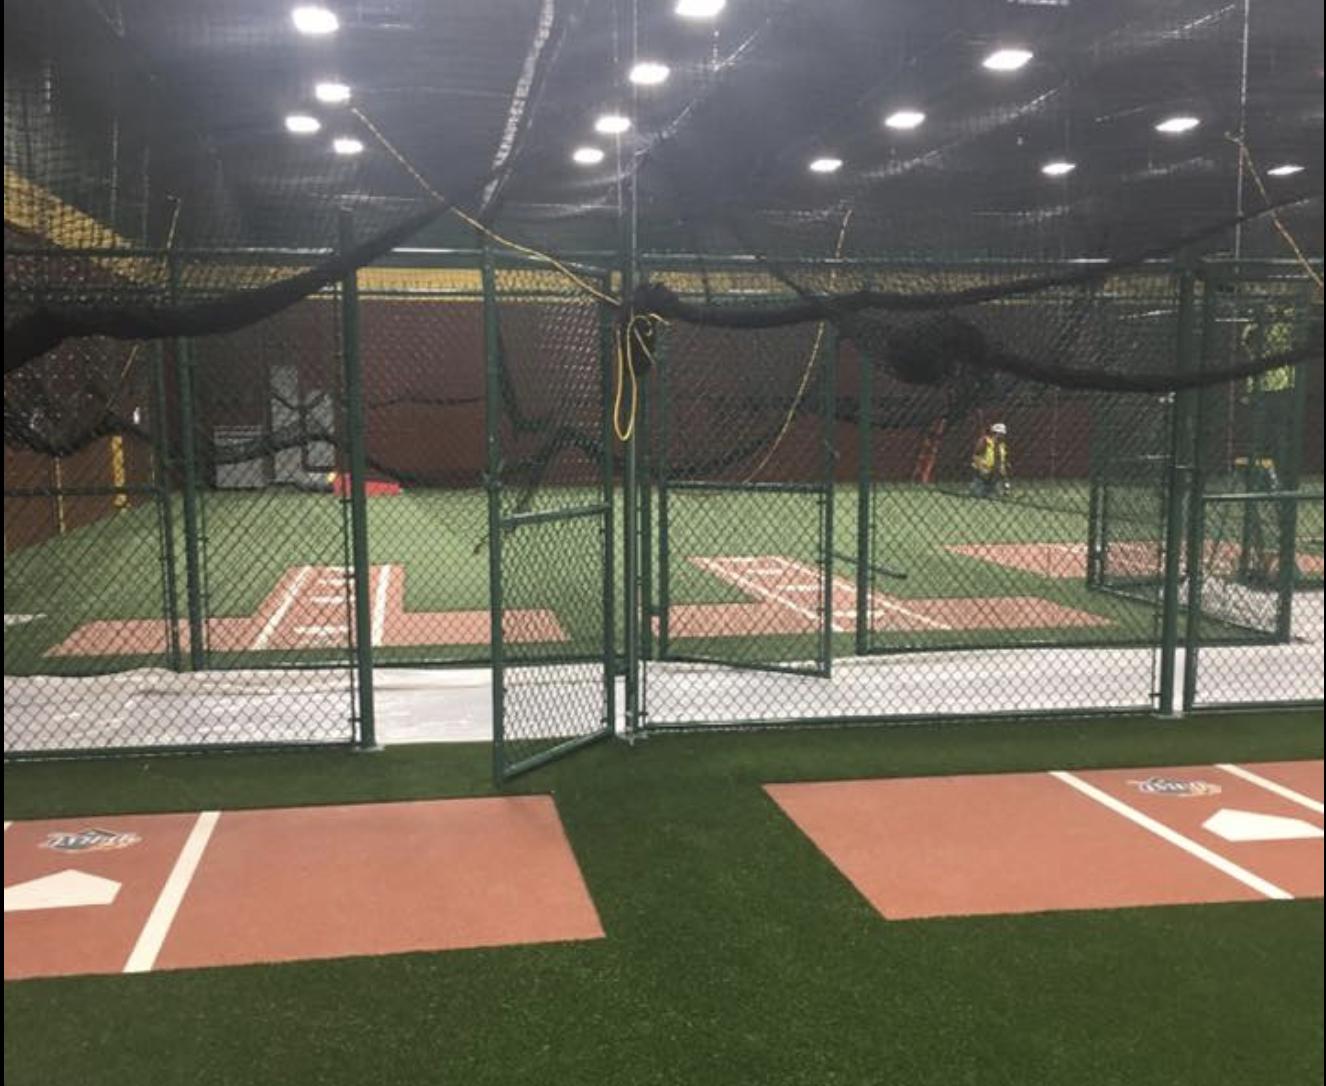 D Bat Boise To Feature Softball And Baseball Clinics More Boisedev